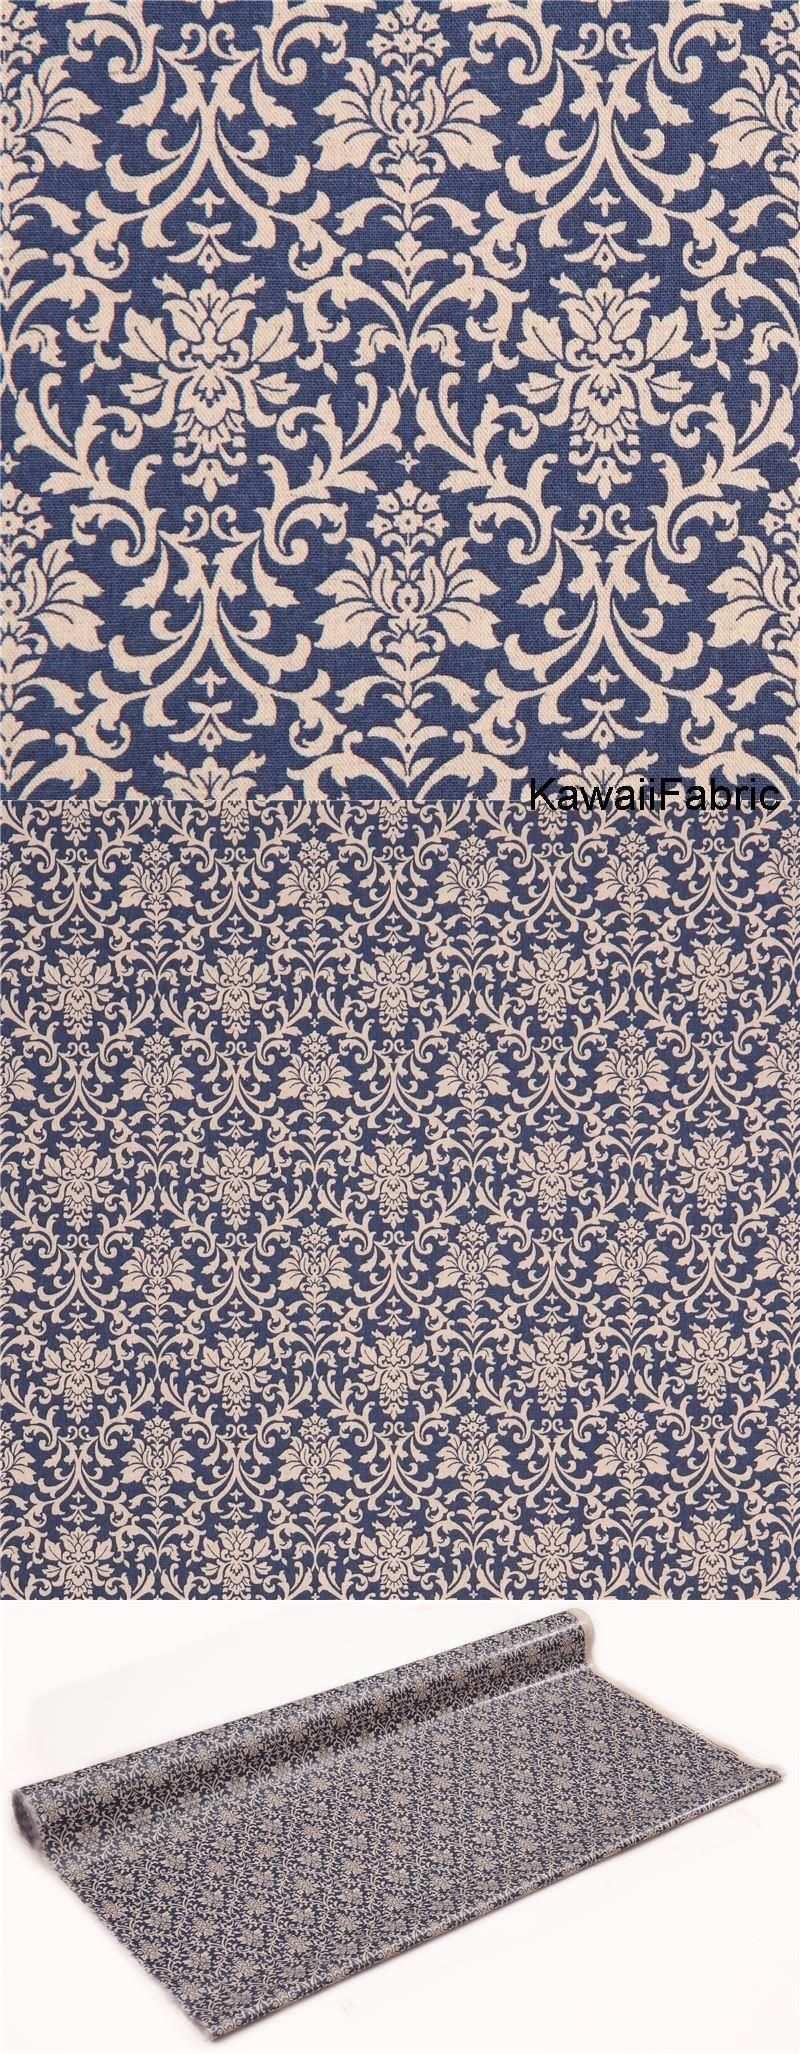 Pin By Kawaii Fabric Shop On Stoff Aus Japan De Laminated Fabric Blue Canvas Canvas Fabric